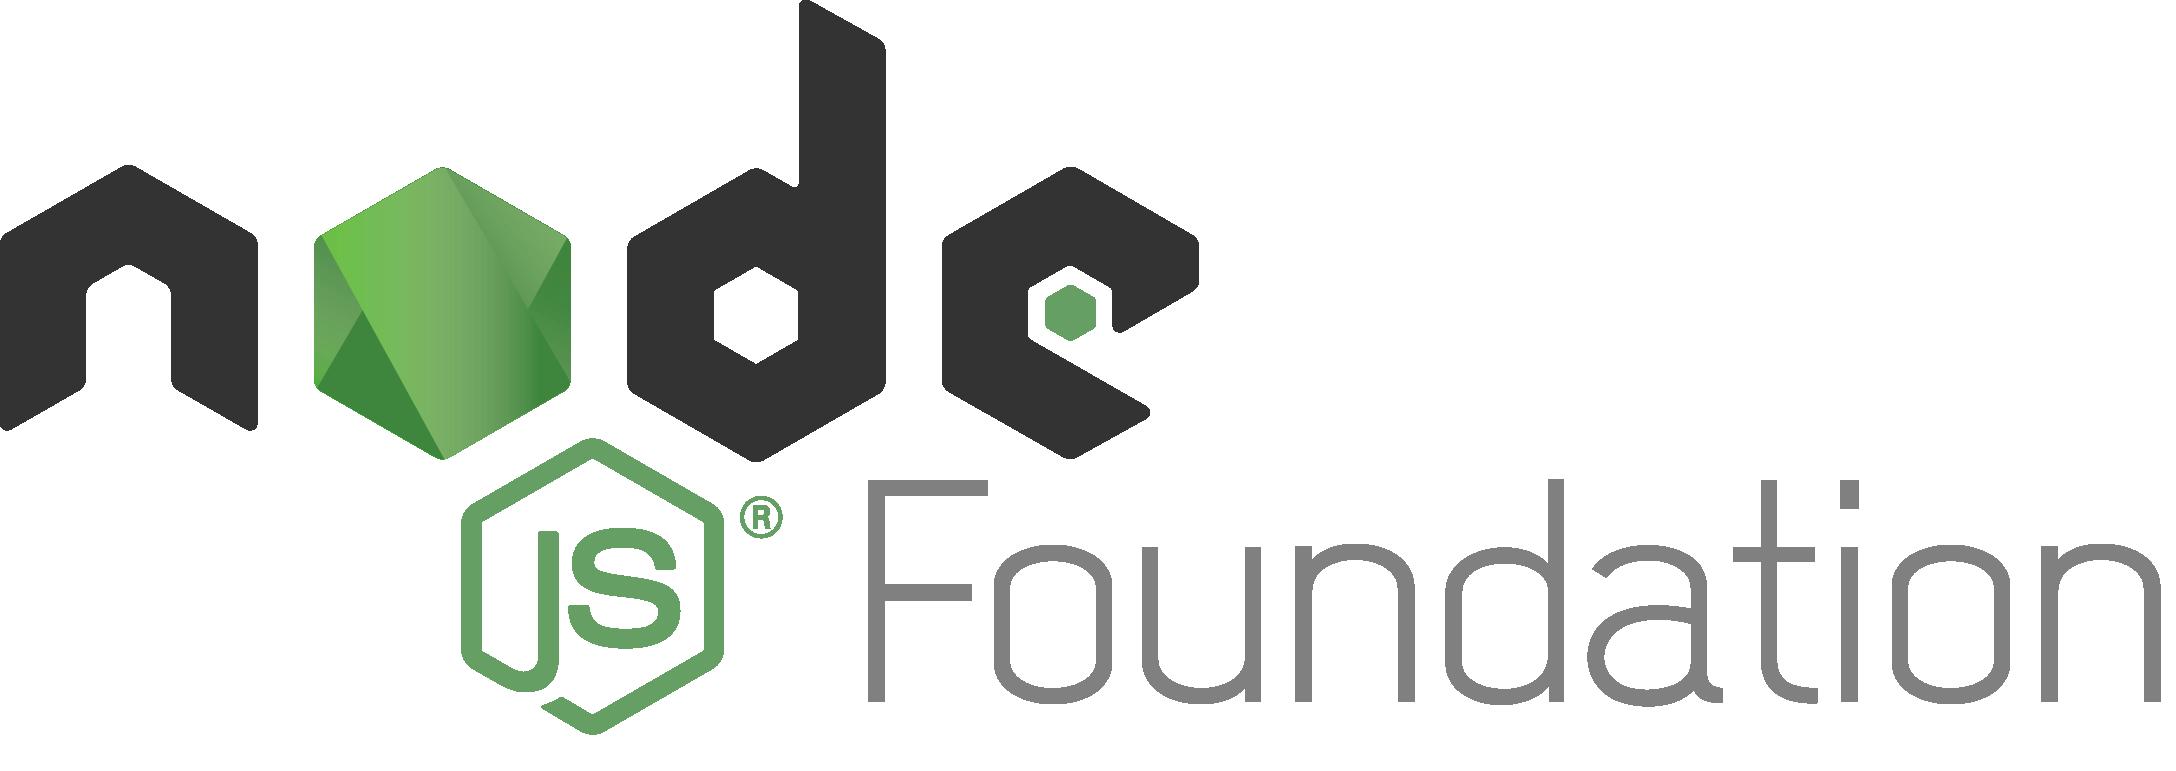 NodeJS_Foundation_Pantone.png